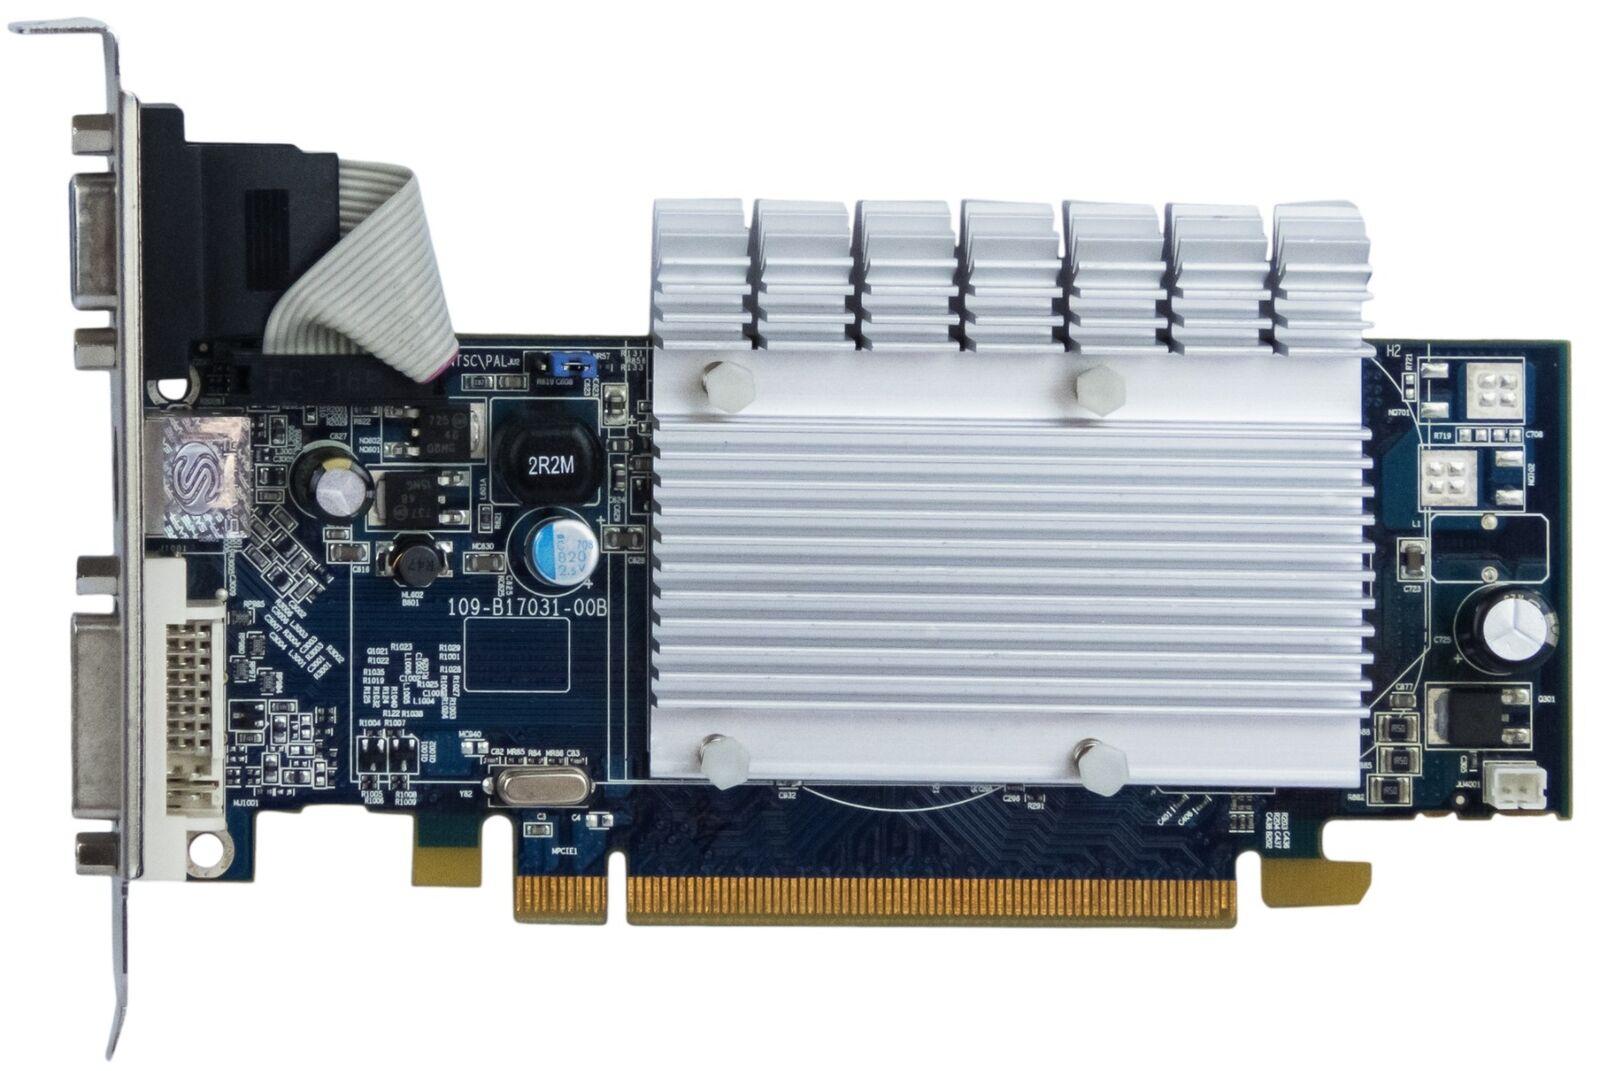 Sapphire ATI Radeon hd2400 Pro 256mb 109